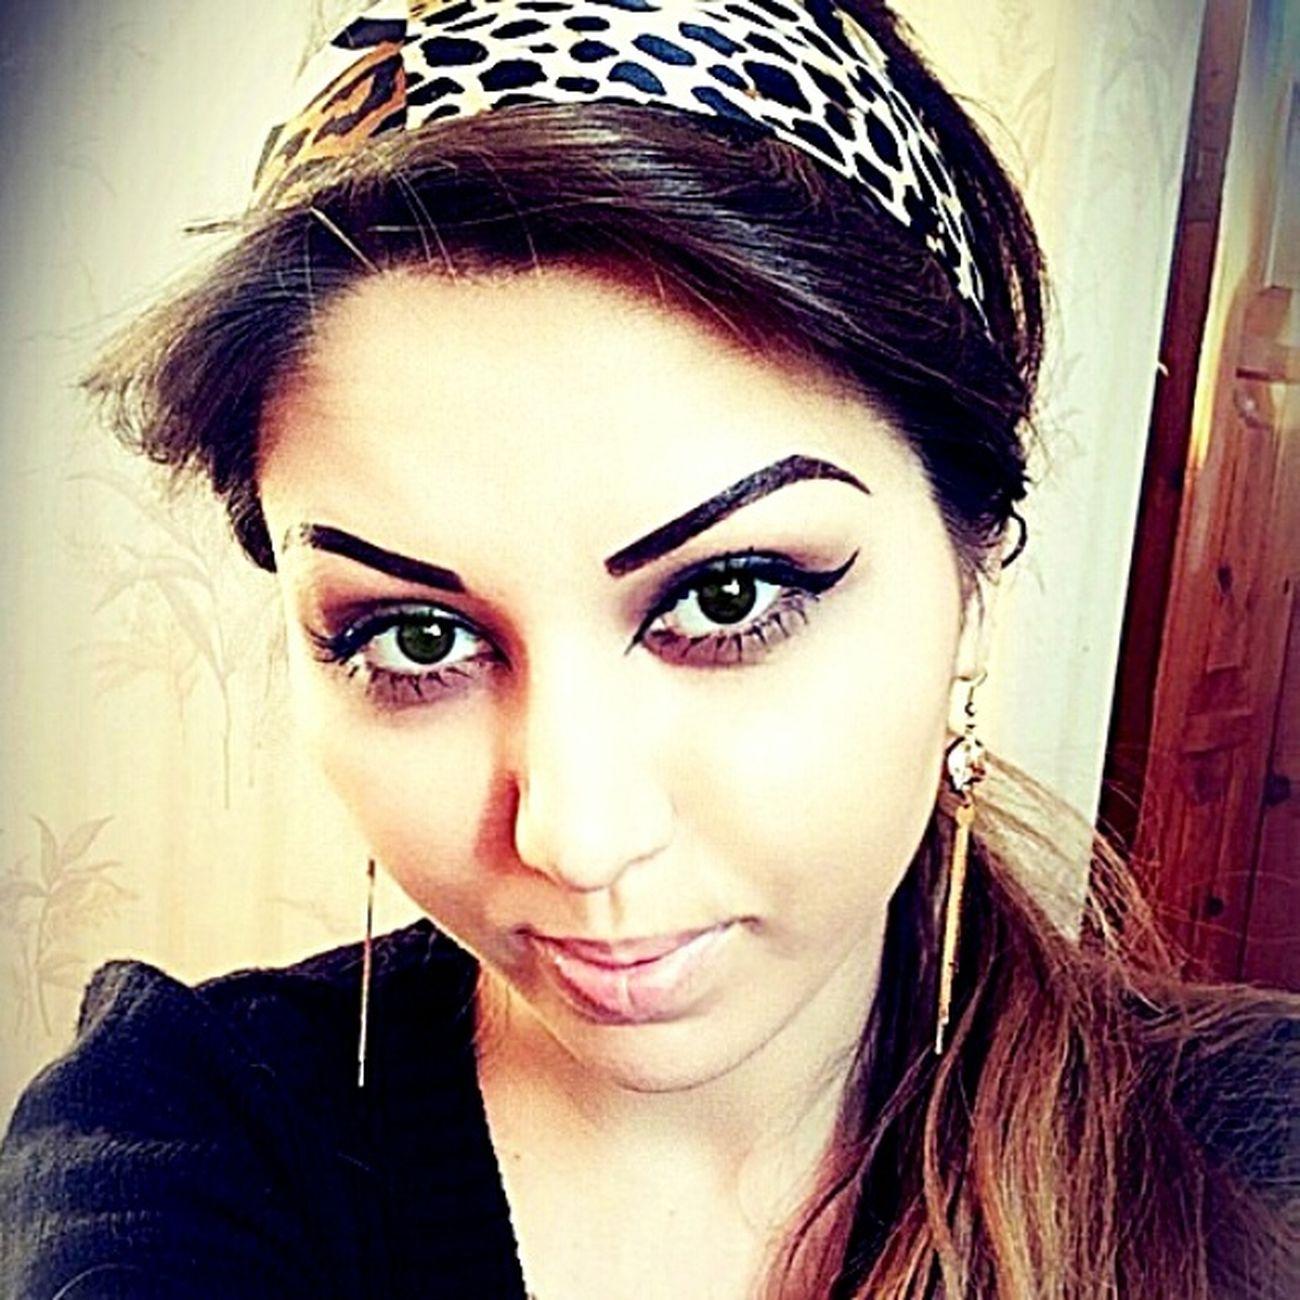 Katiel Khalif Fotosession Foto Islam Muslim Girls Dubai Model At Home lovely))